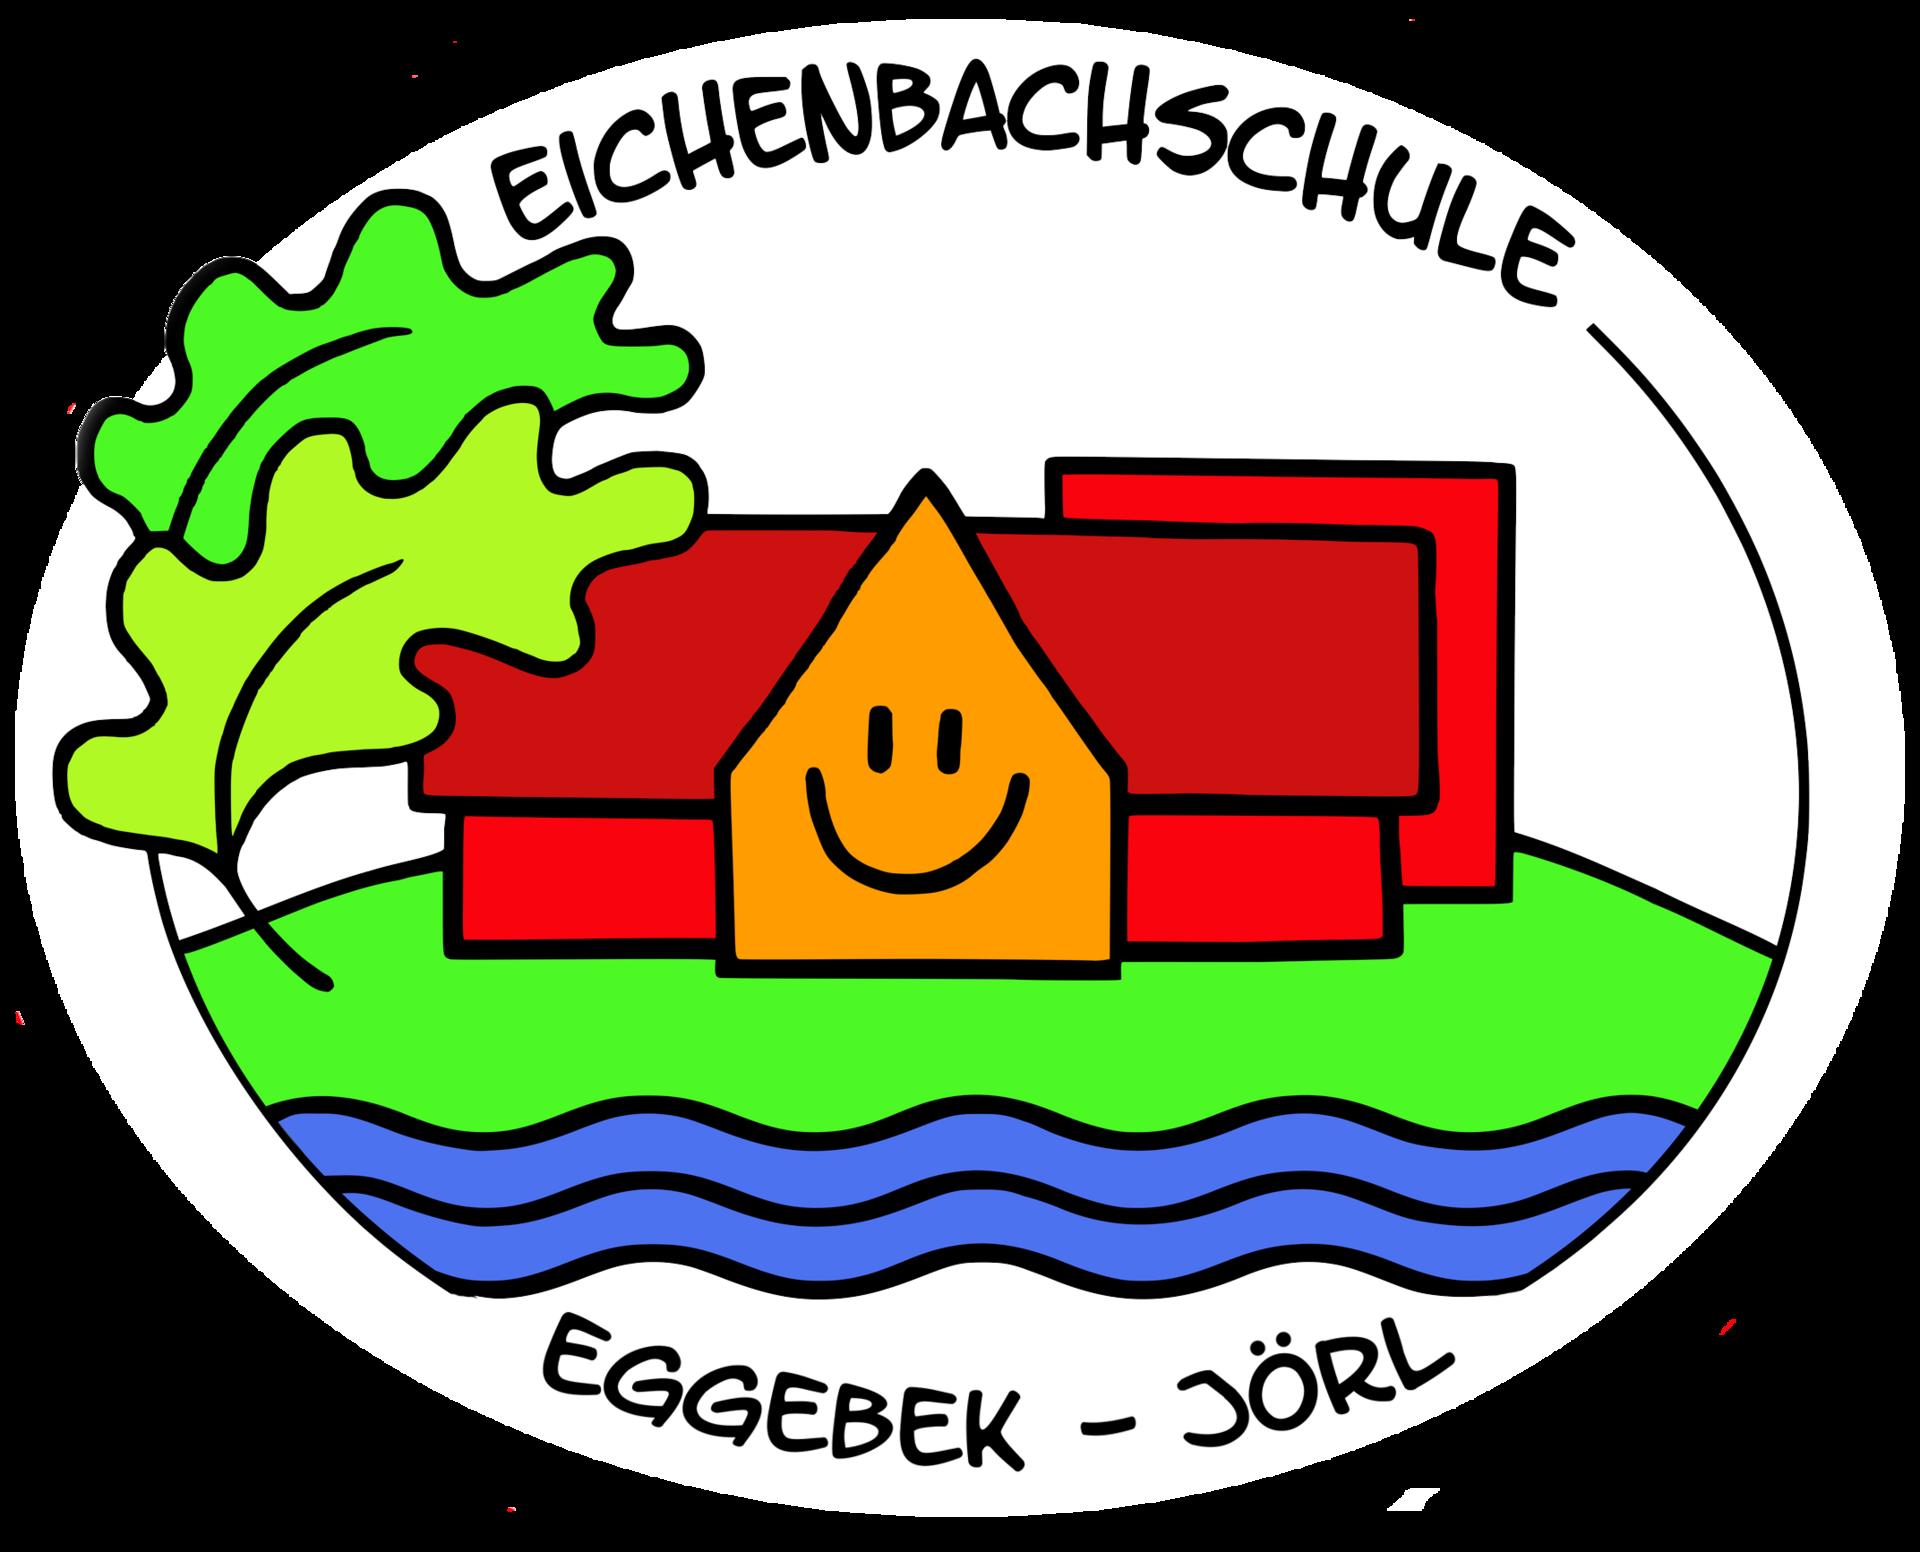 Eichenbachschule Eggebek-Jörl